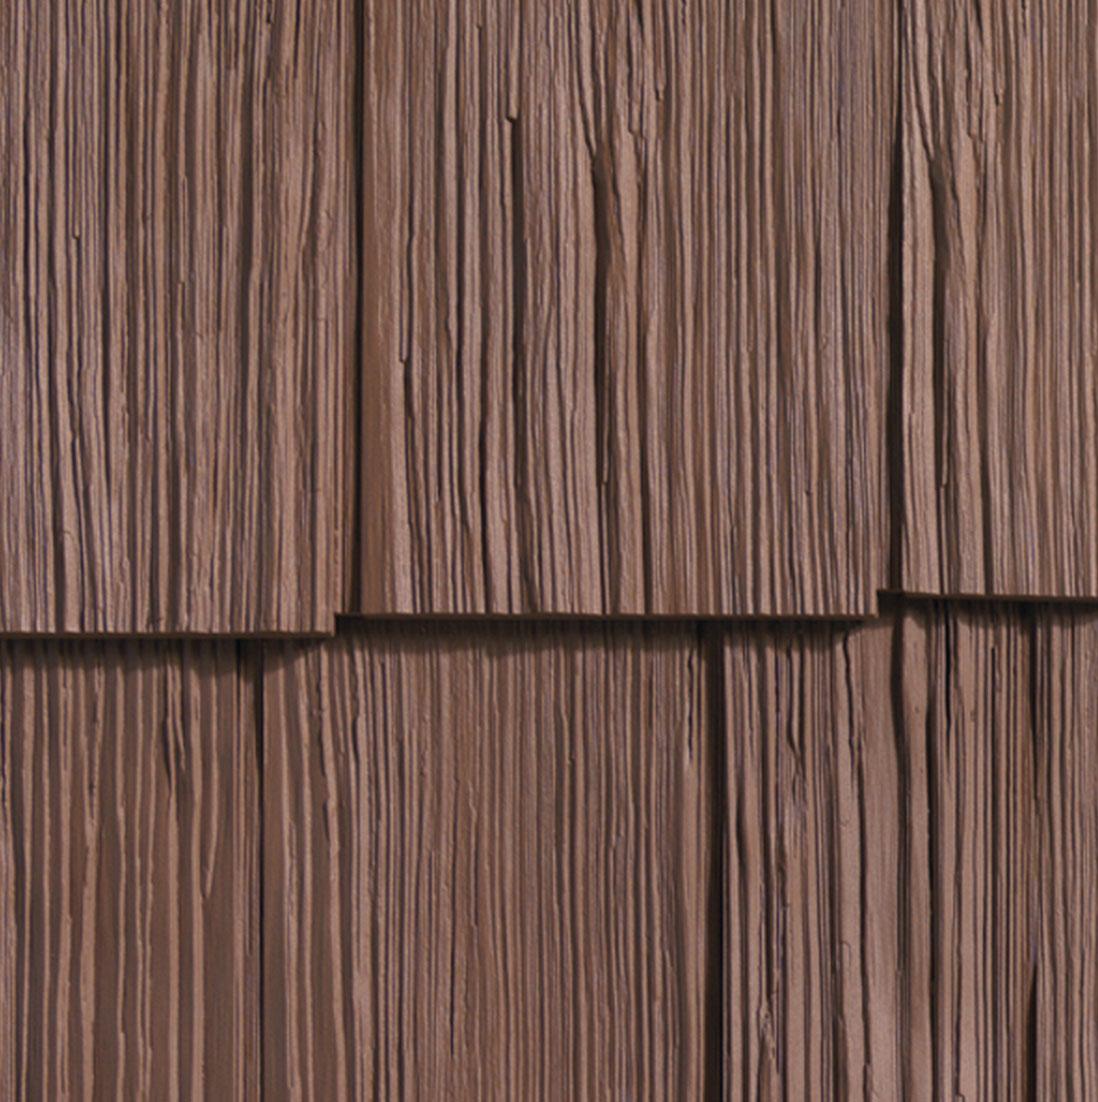 Mastic Vinyl or Polymer Shingle Siding